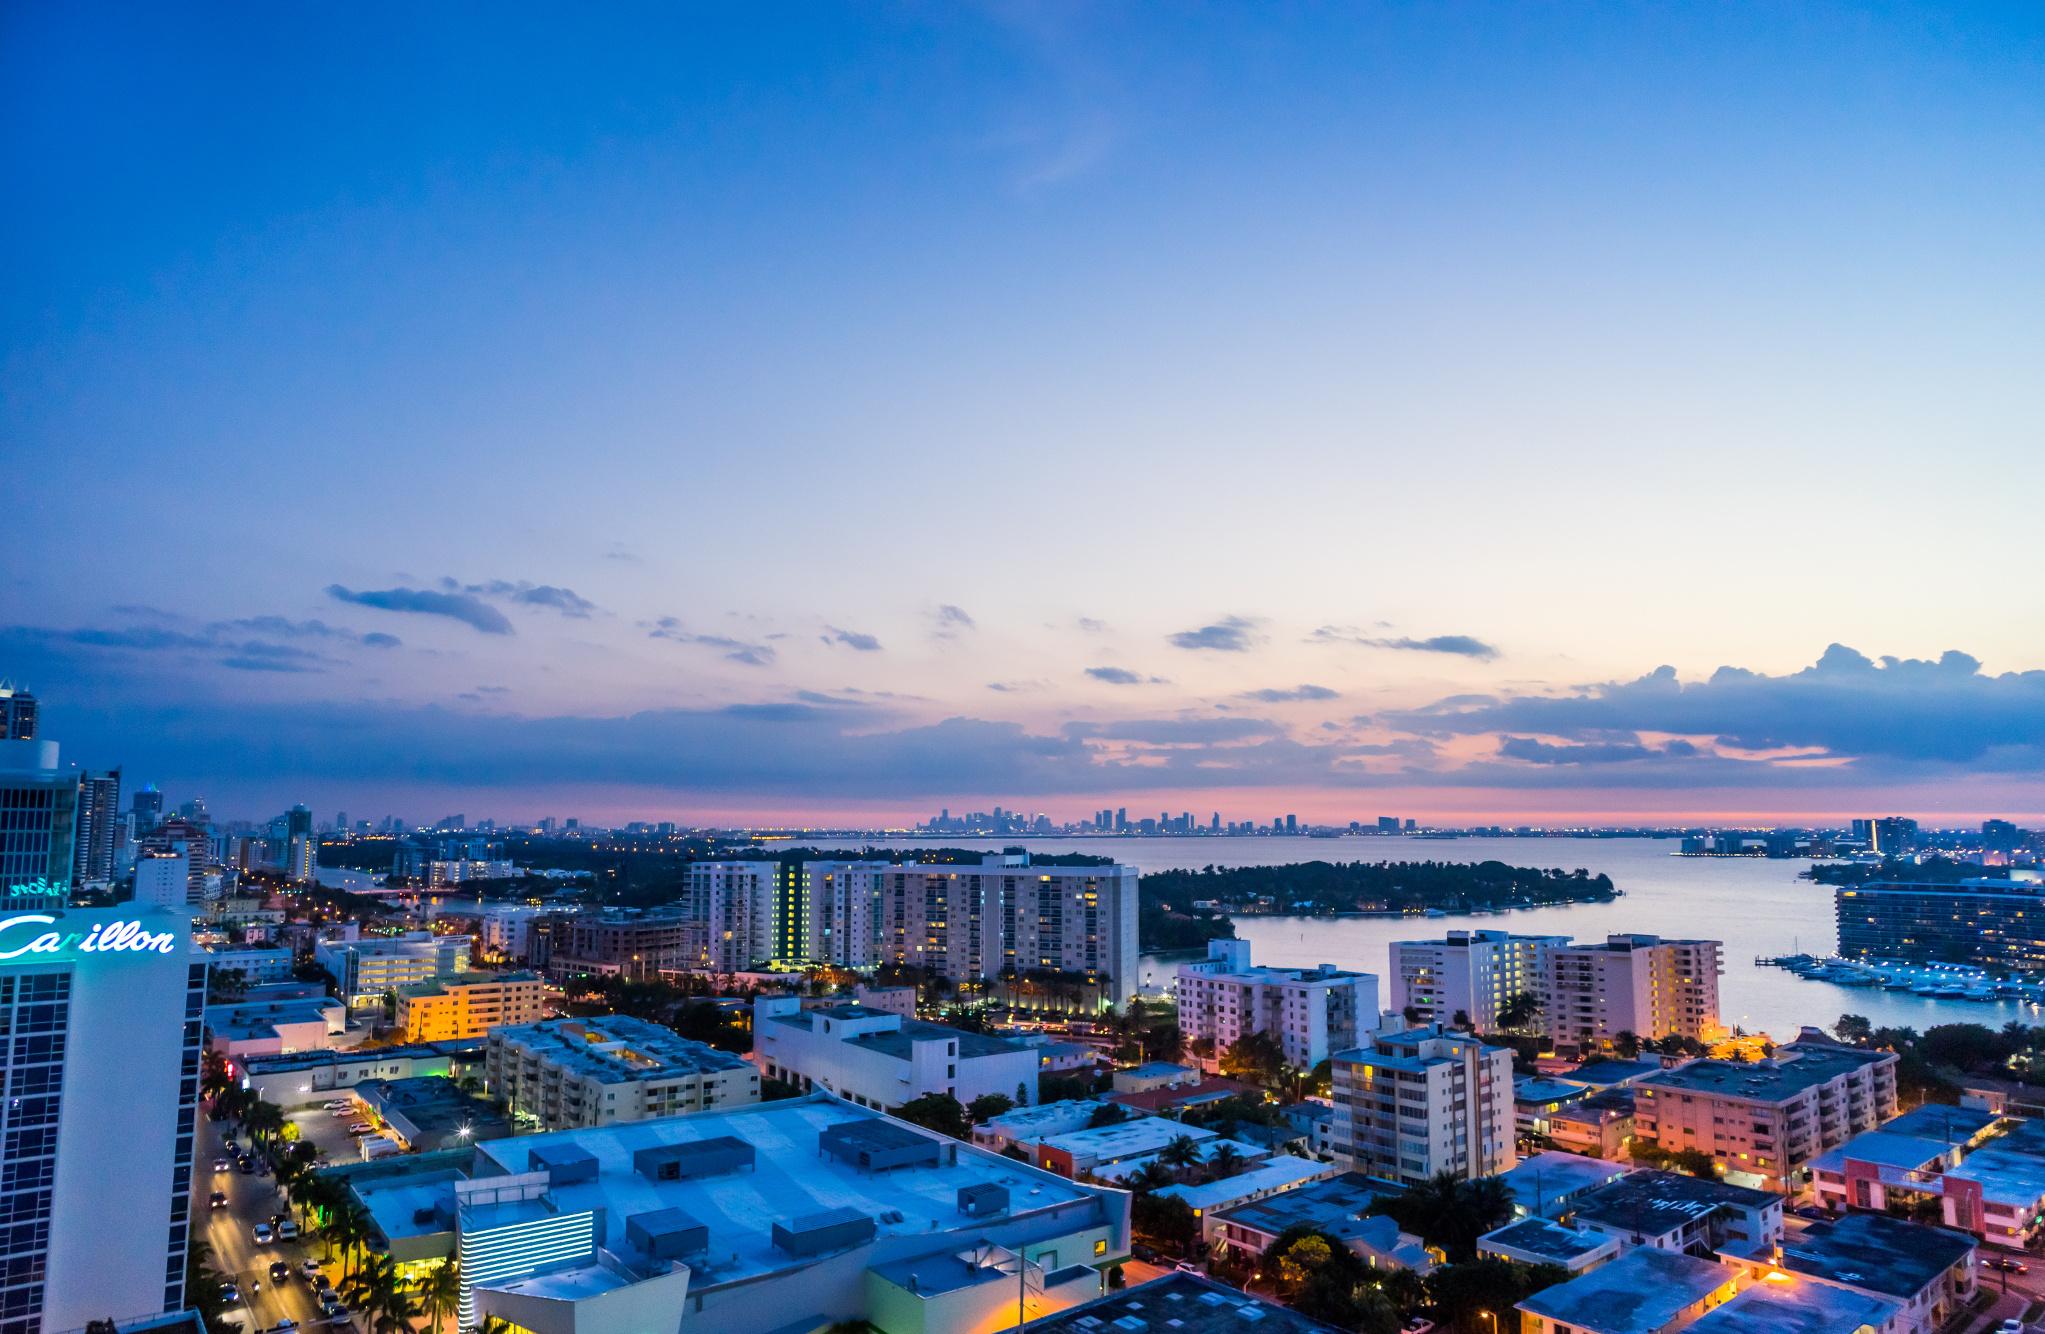 Penthouse at L'Atelier Residences, Miami Beach - Downtown view